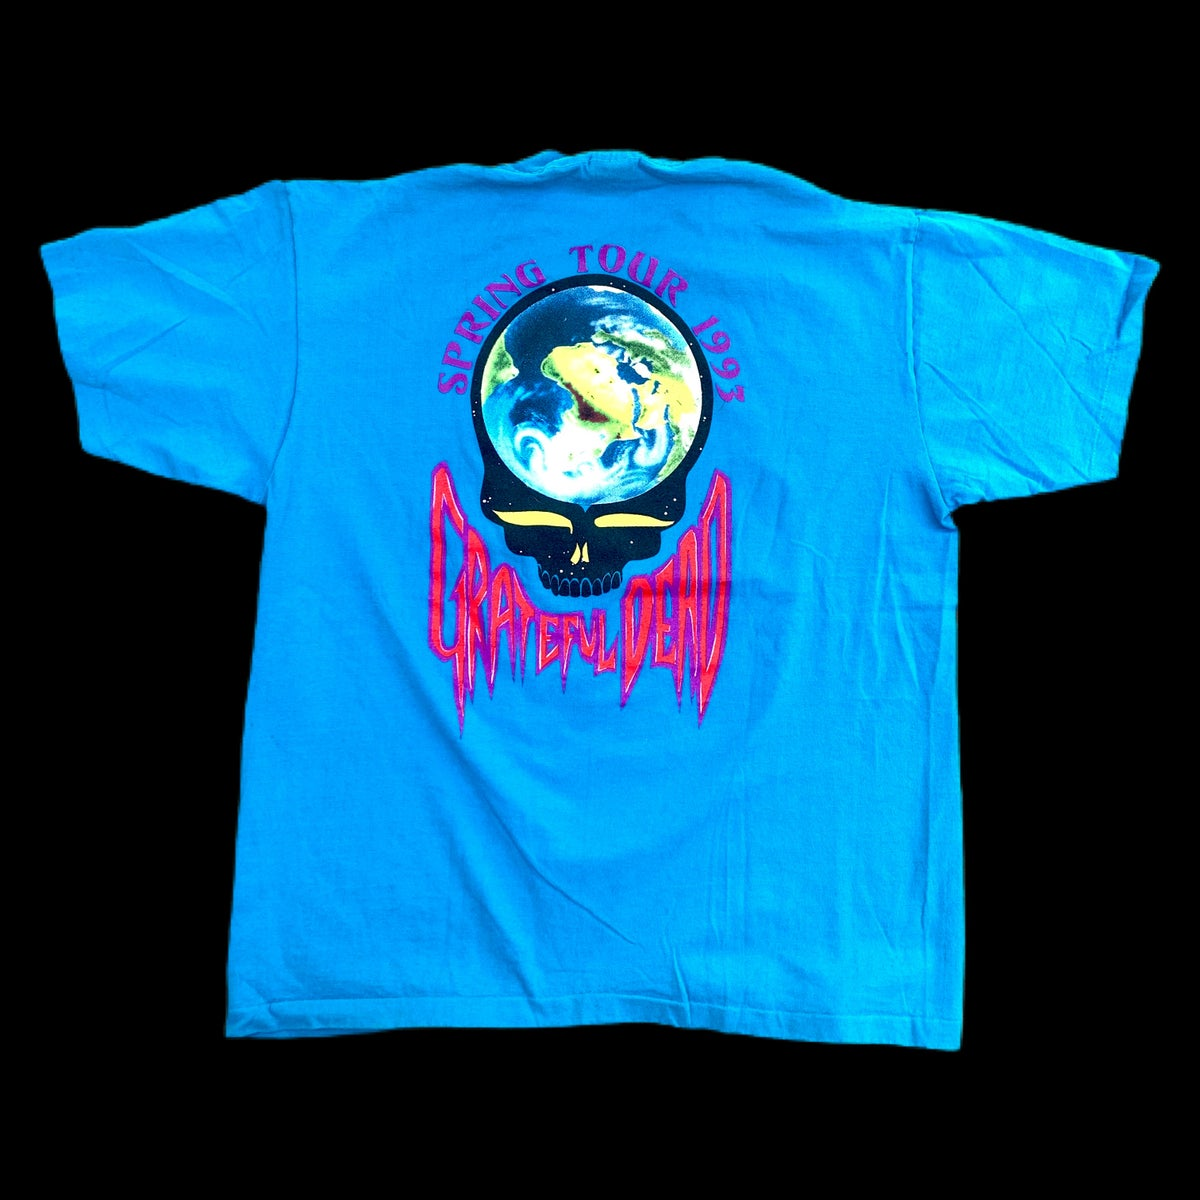 Original Vintage Grateful Dead Spring Tour 1993  - XL